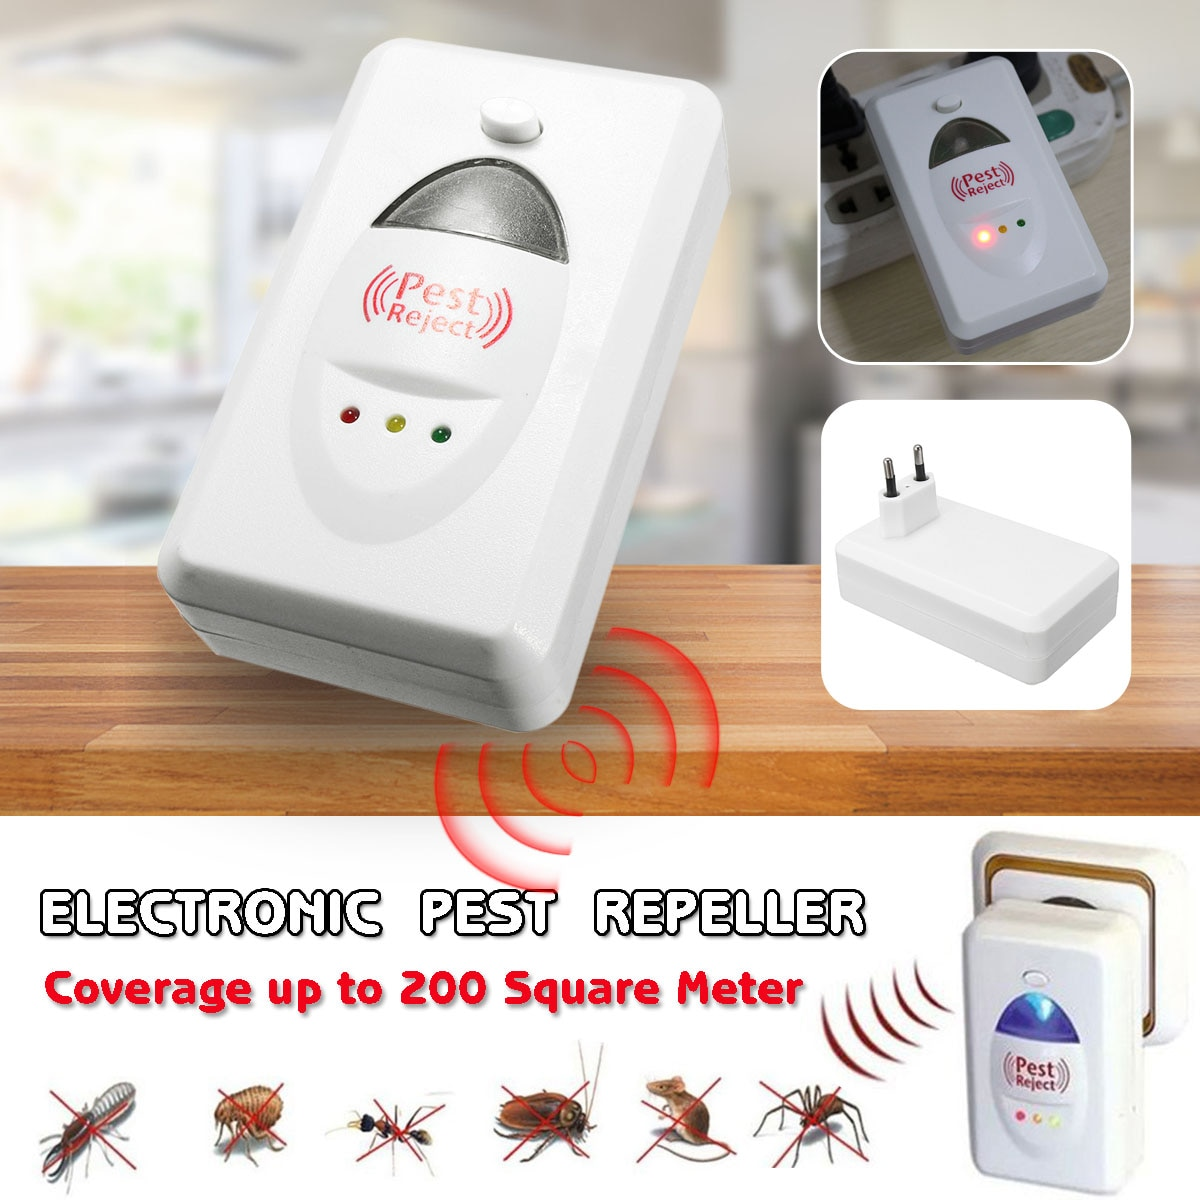 220V luz efectiva repelente ultrasónico Control electrónico ratones repelentes de plagas roedor cucaracha Mosquito asesino de insectos